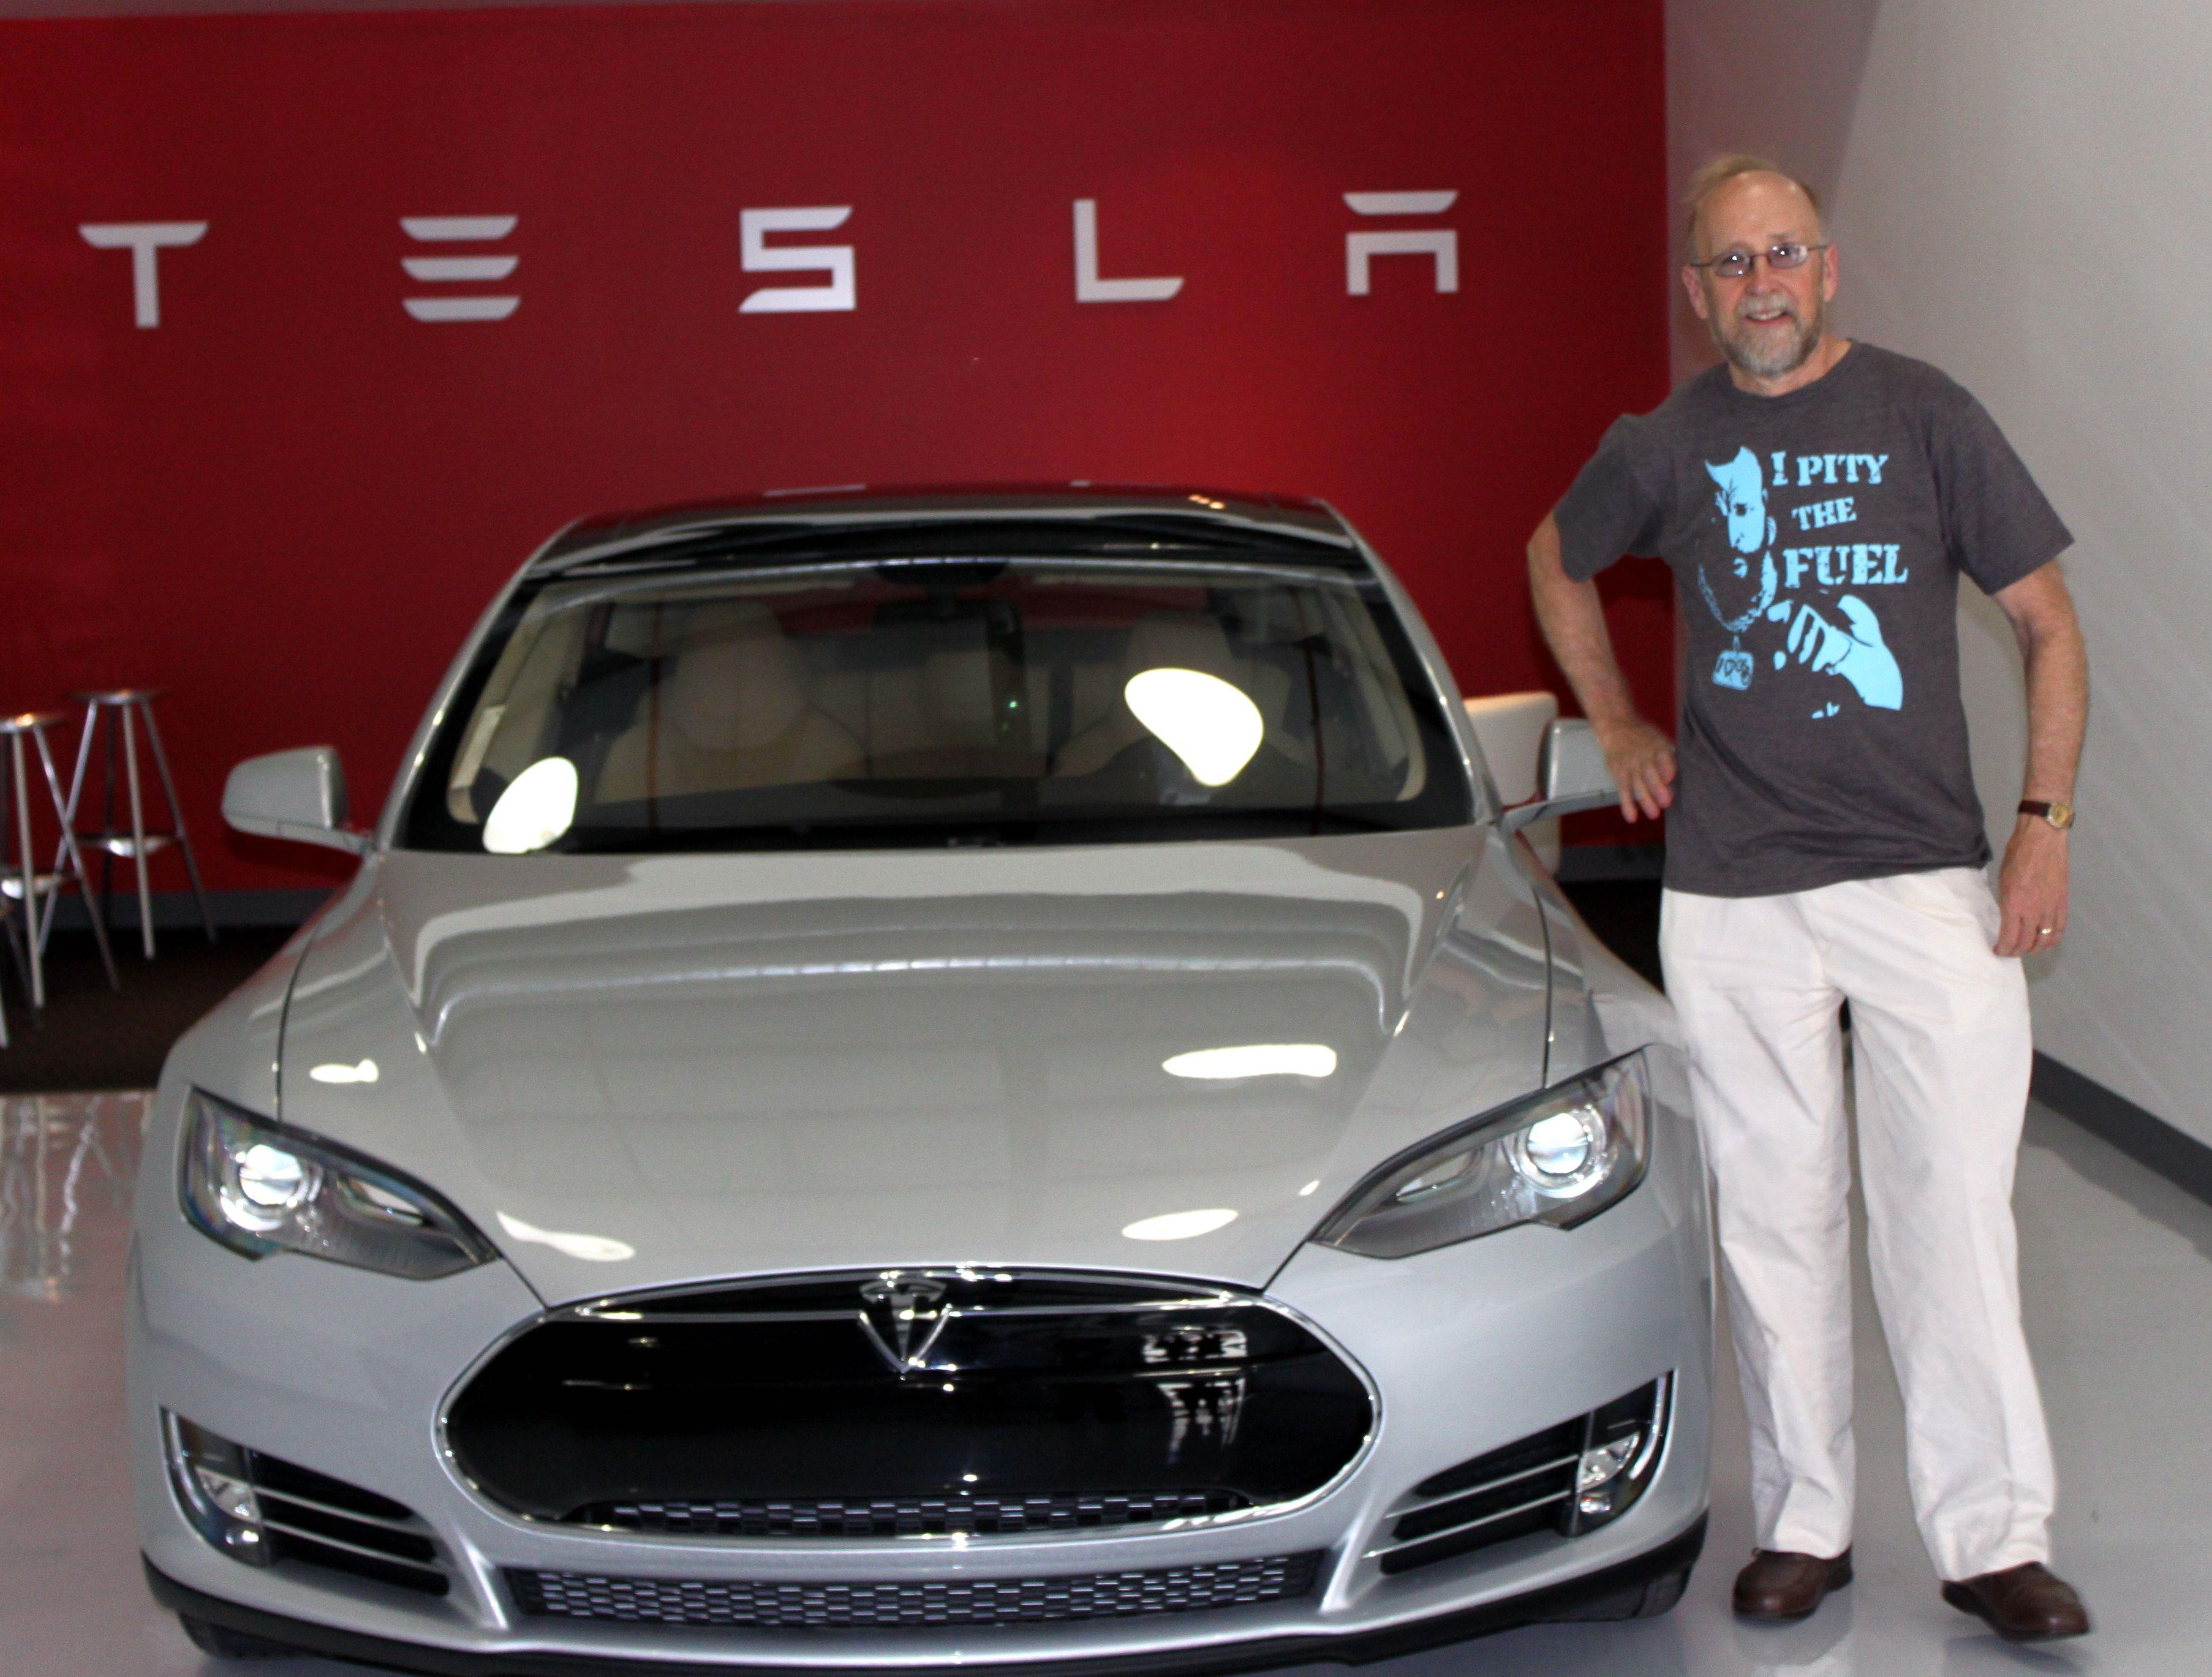 Bill with the Tesla.jpg